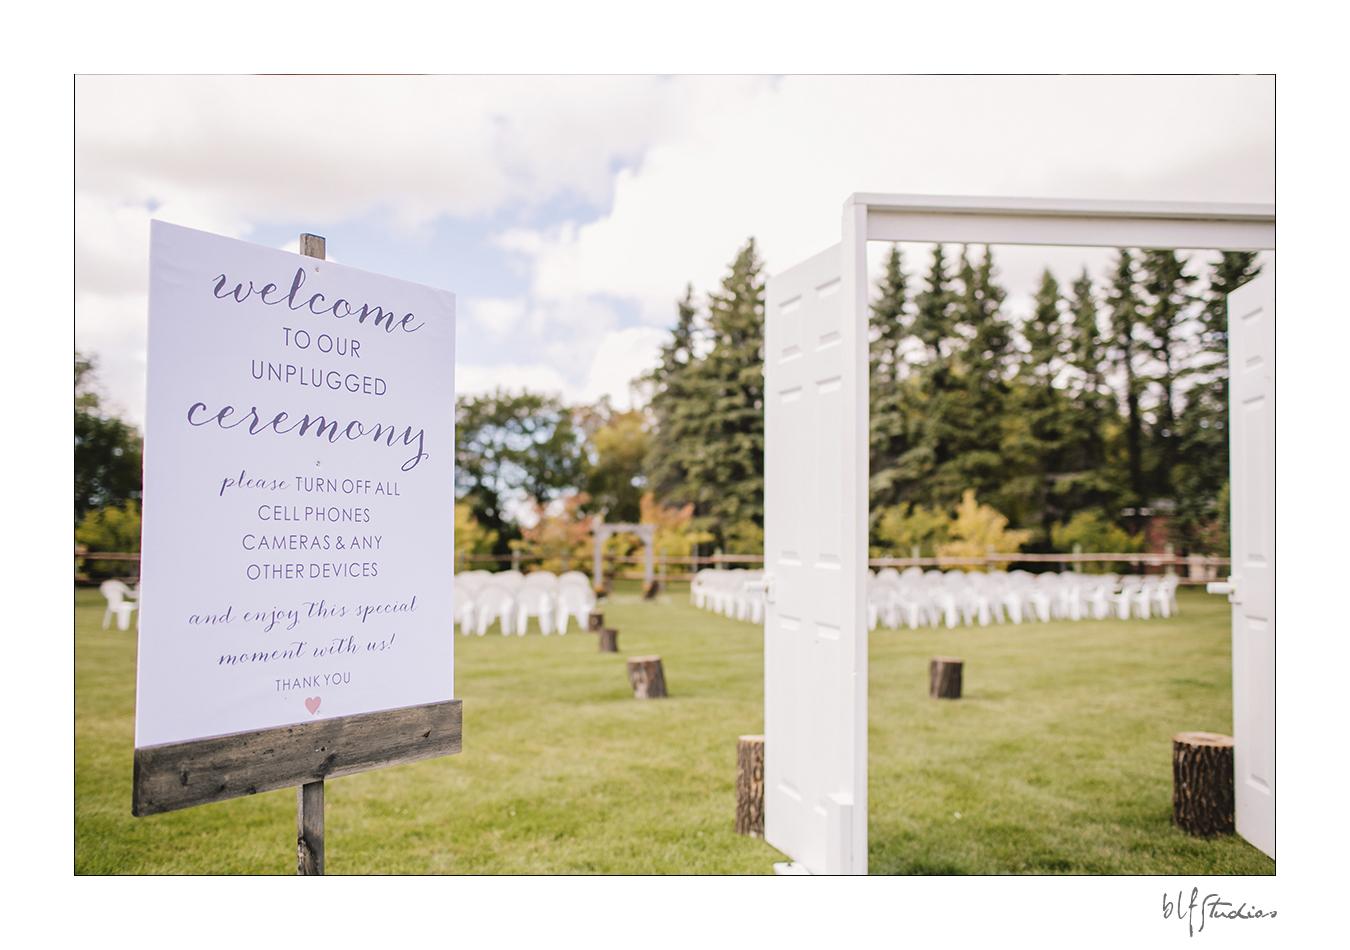 003-winnipeg-hitchnpost-wedding-marla-alana.jpg